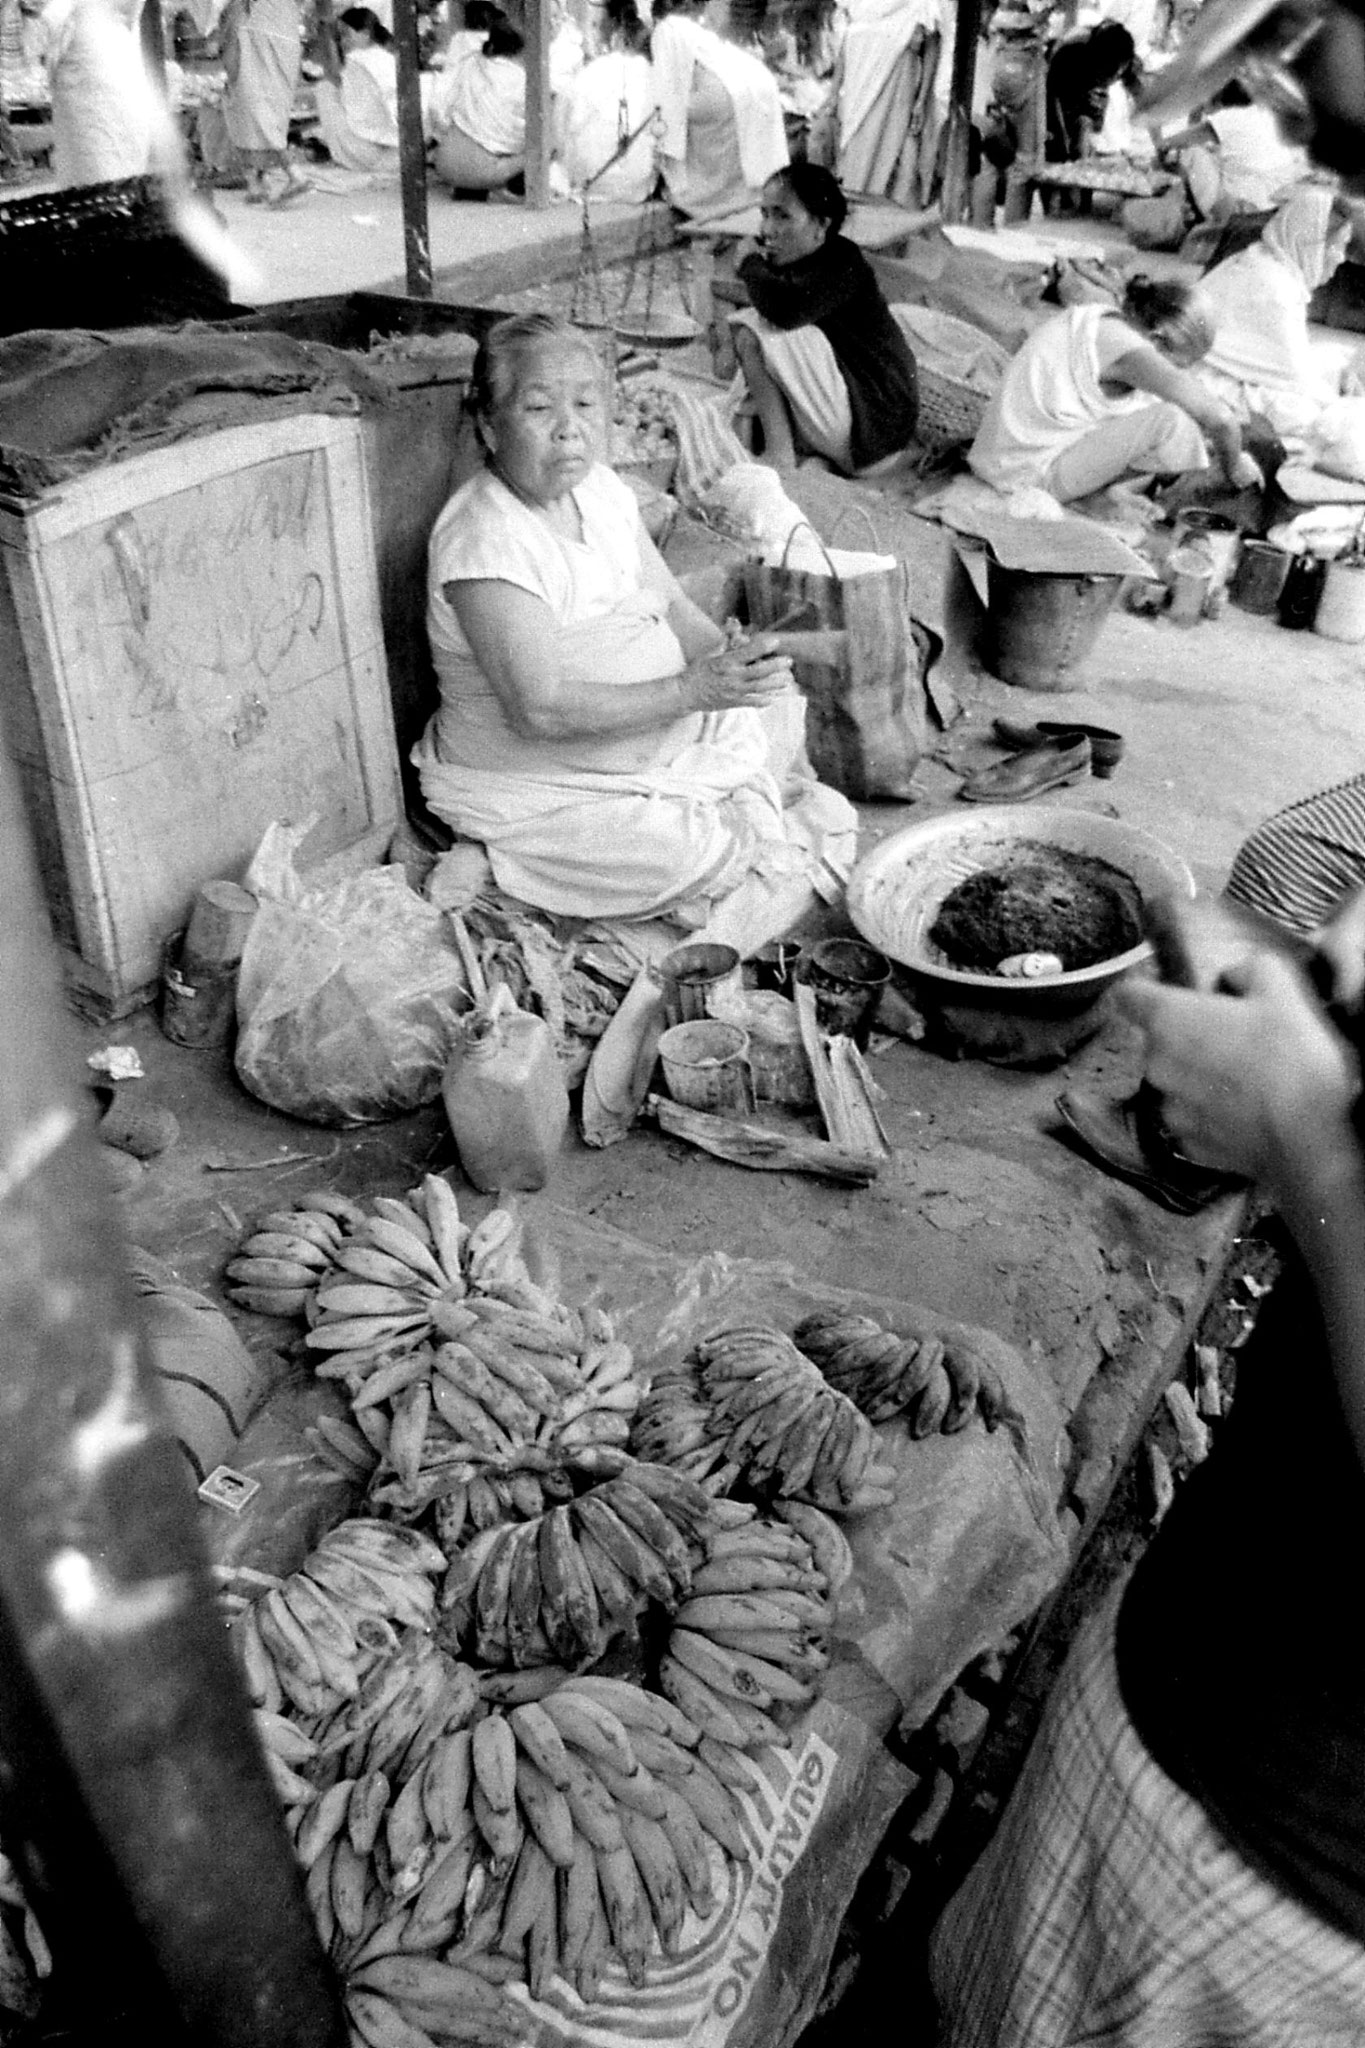 17/4/1990: 9: Imphal women's market